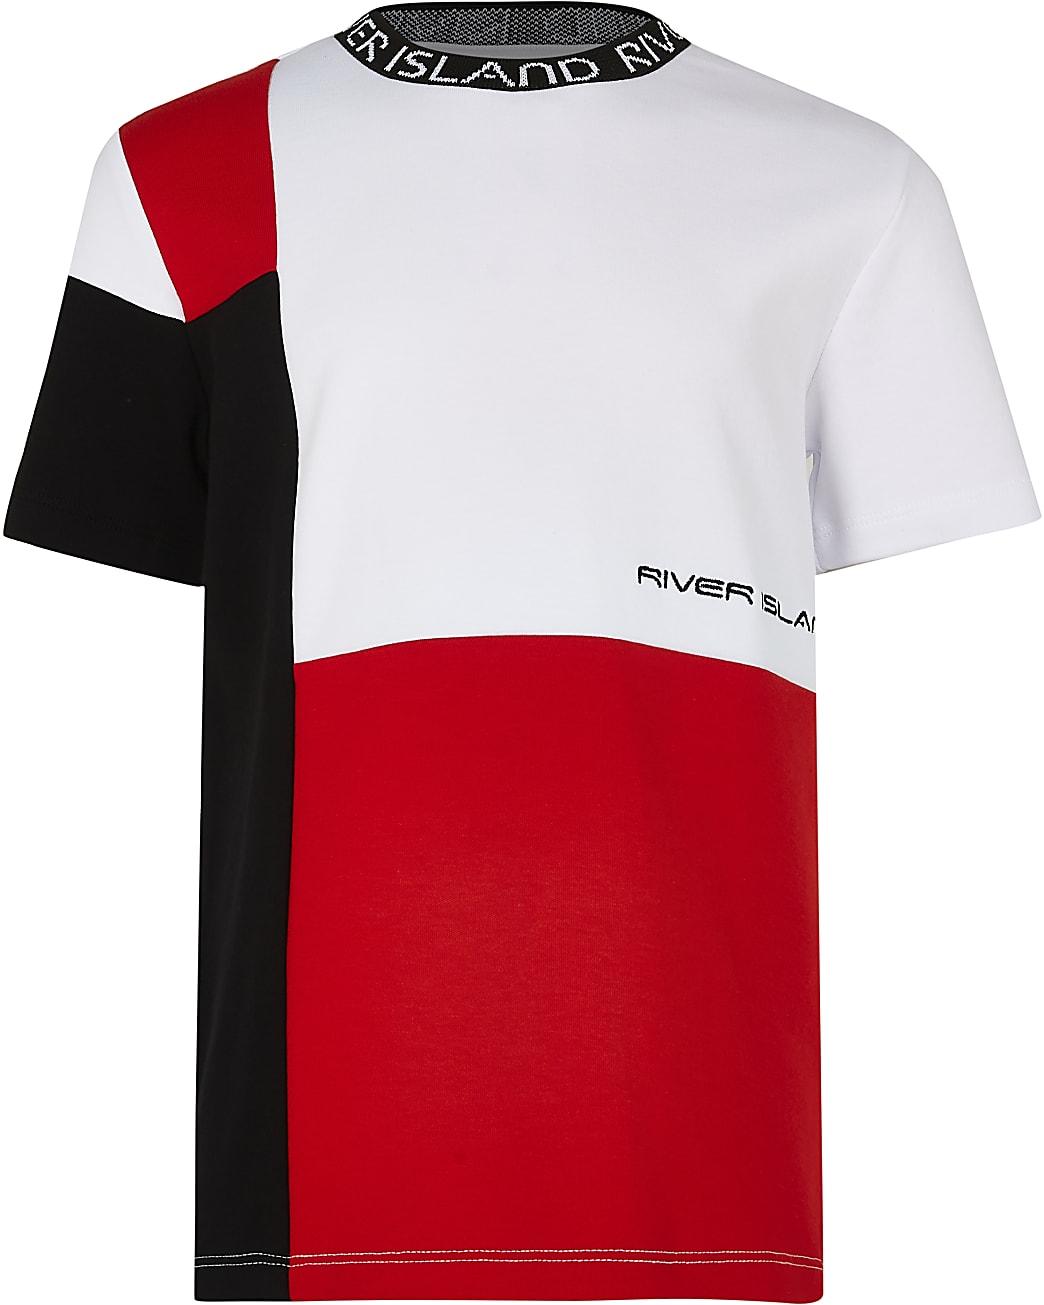 Boys red RI colour block t-shirt